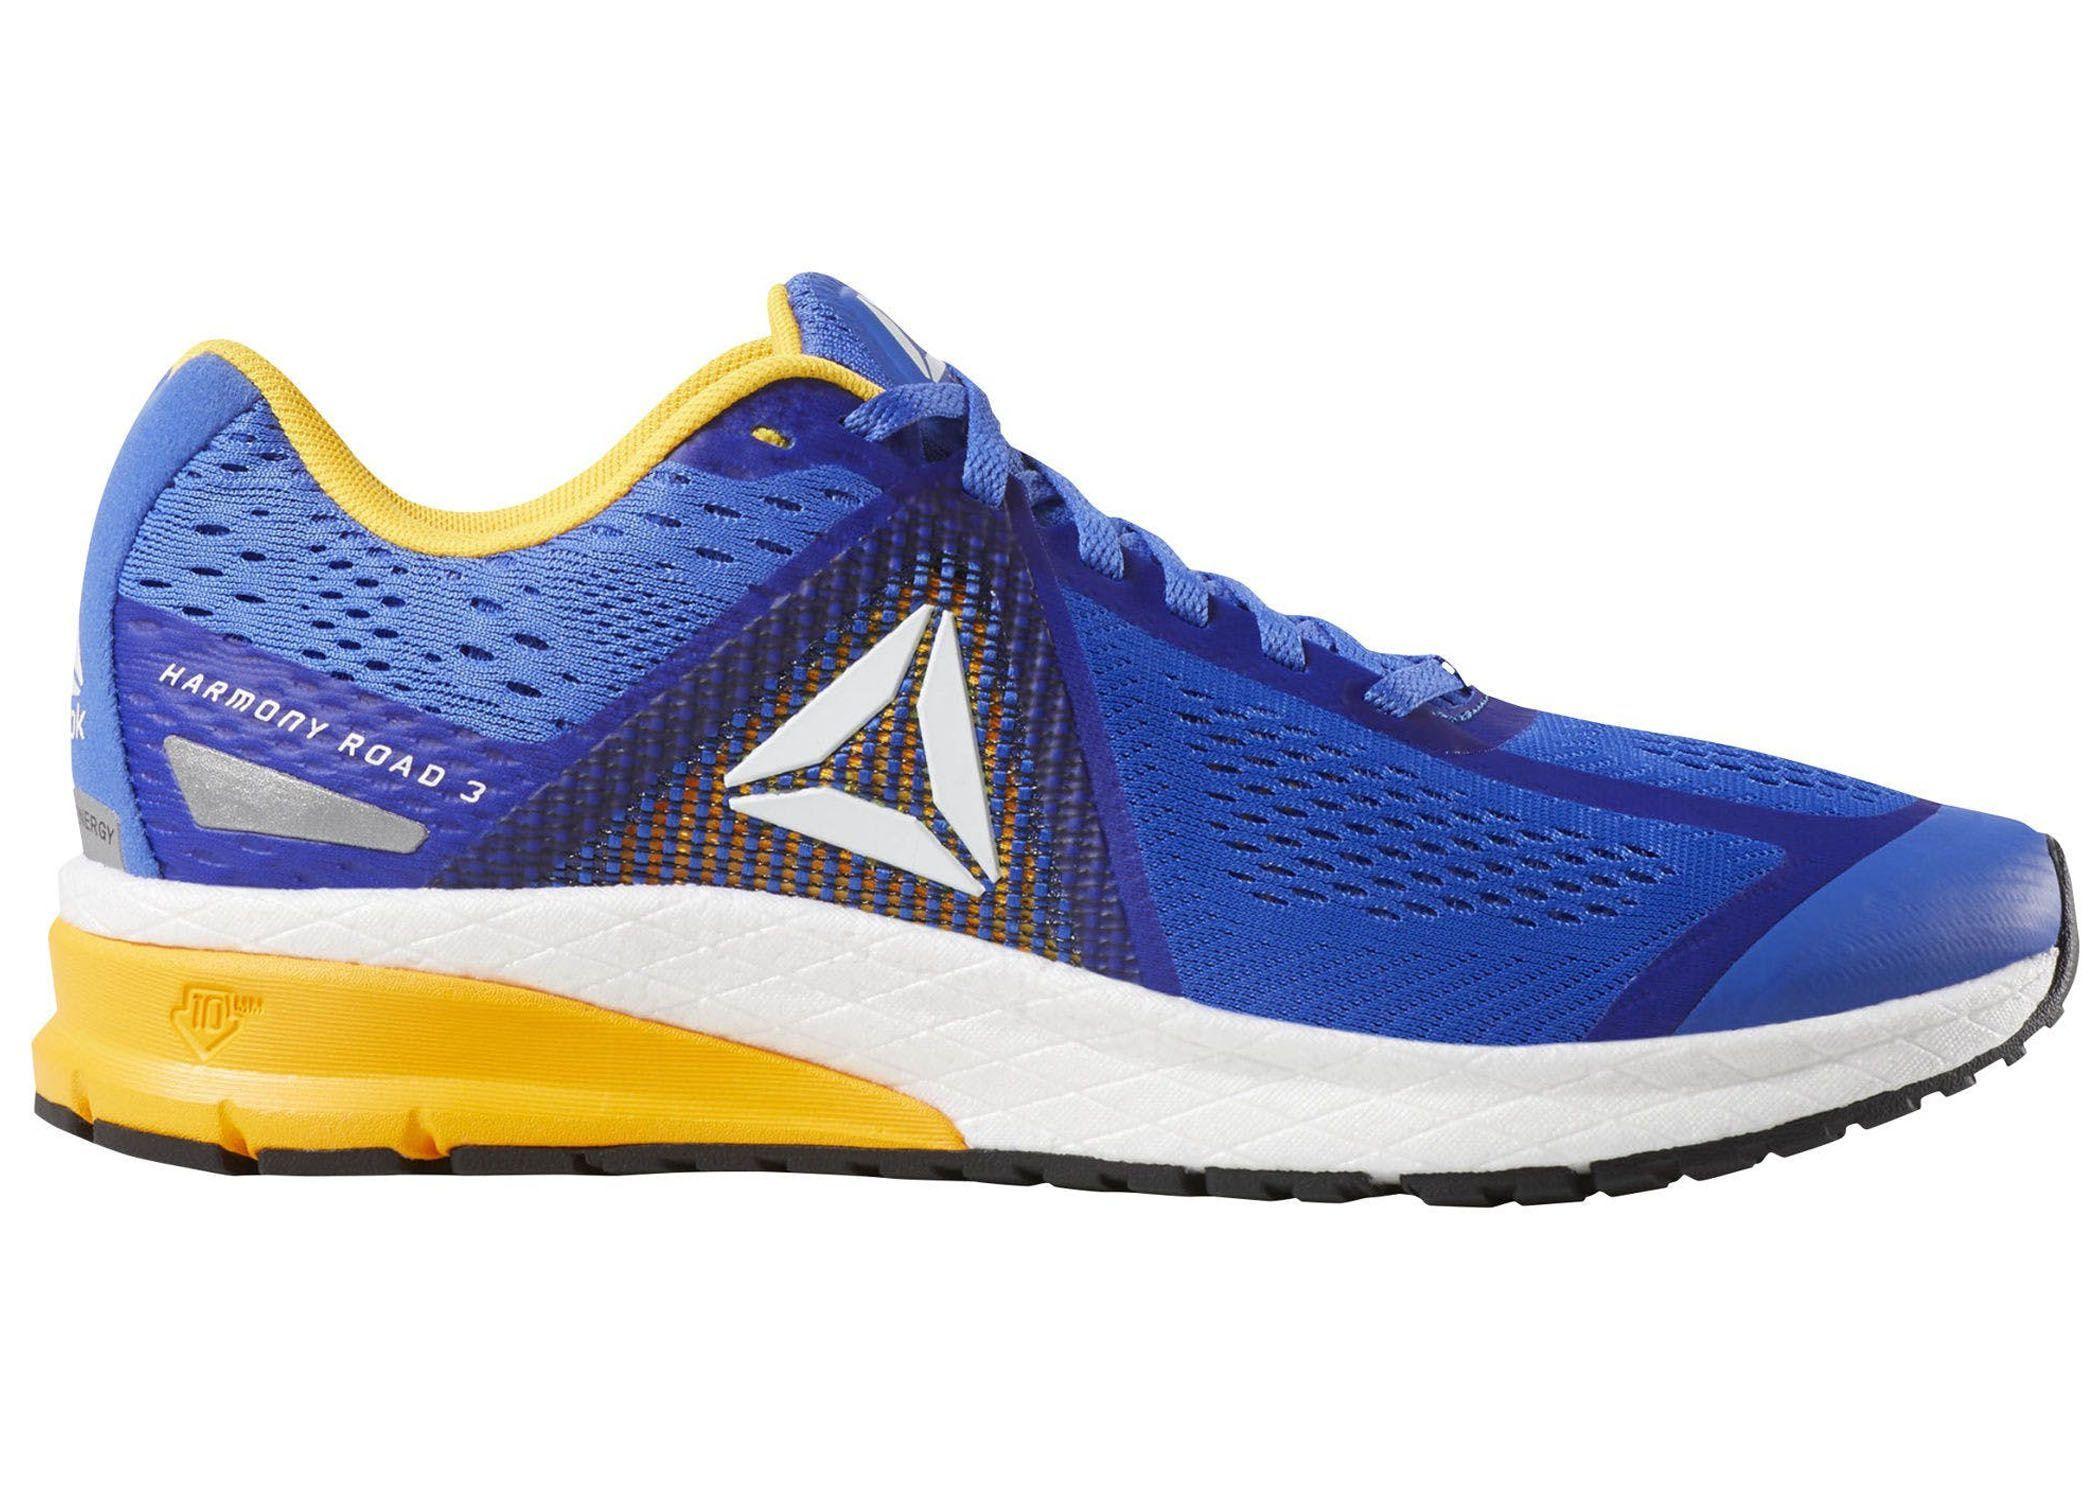 1cc37961780b9 10 Best Running Shoes for Men 2019 - Men's Running Sneaker Reviews